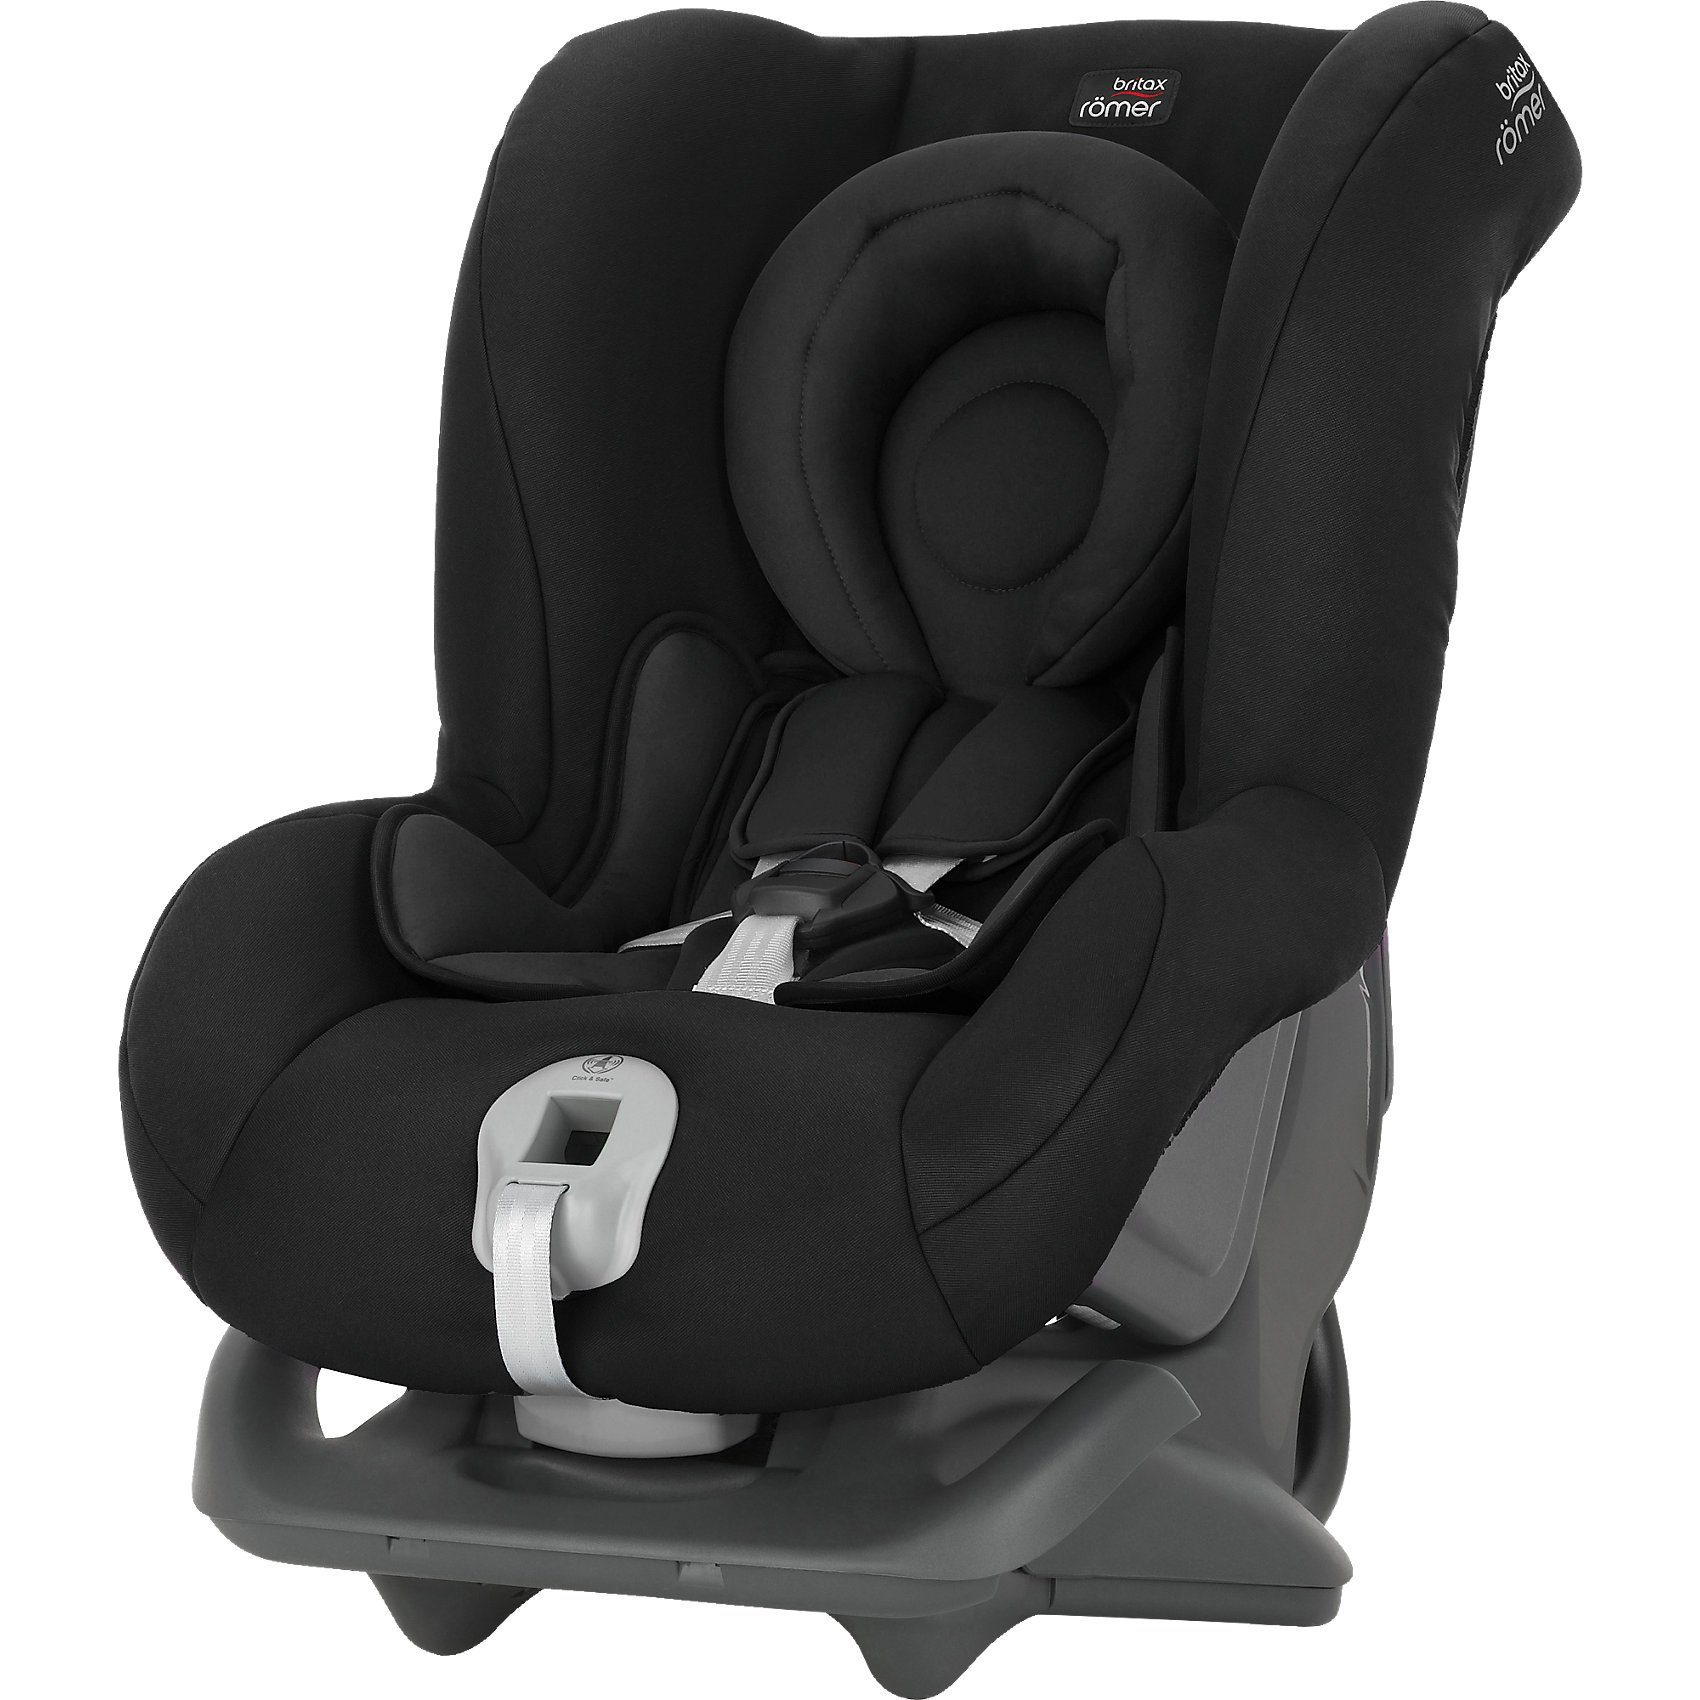 Britax Römer Auto-Kindersitz First Class Plus, Cosmos Black, 2018